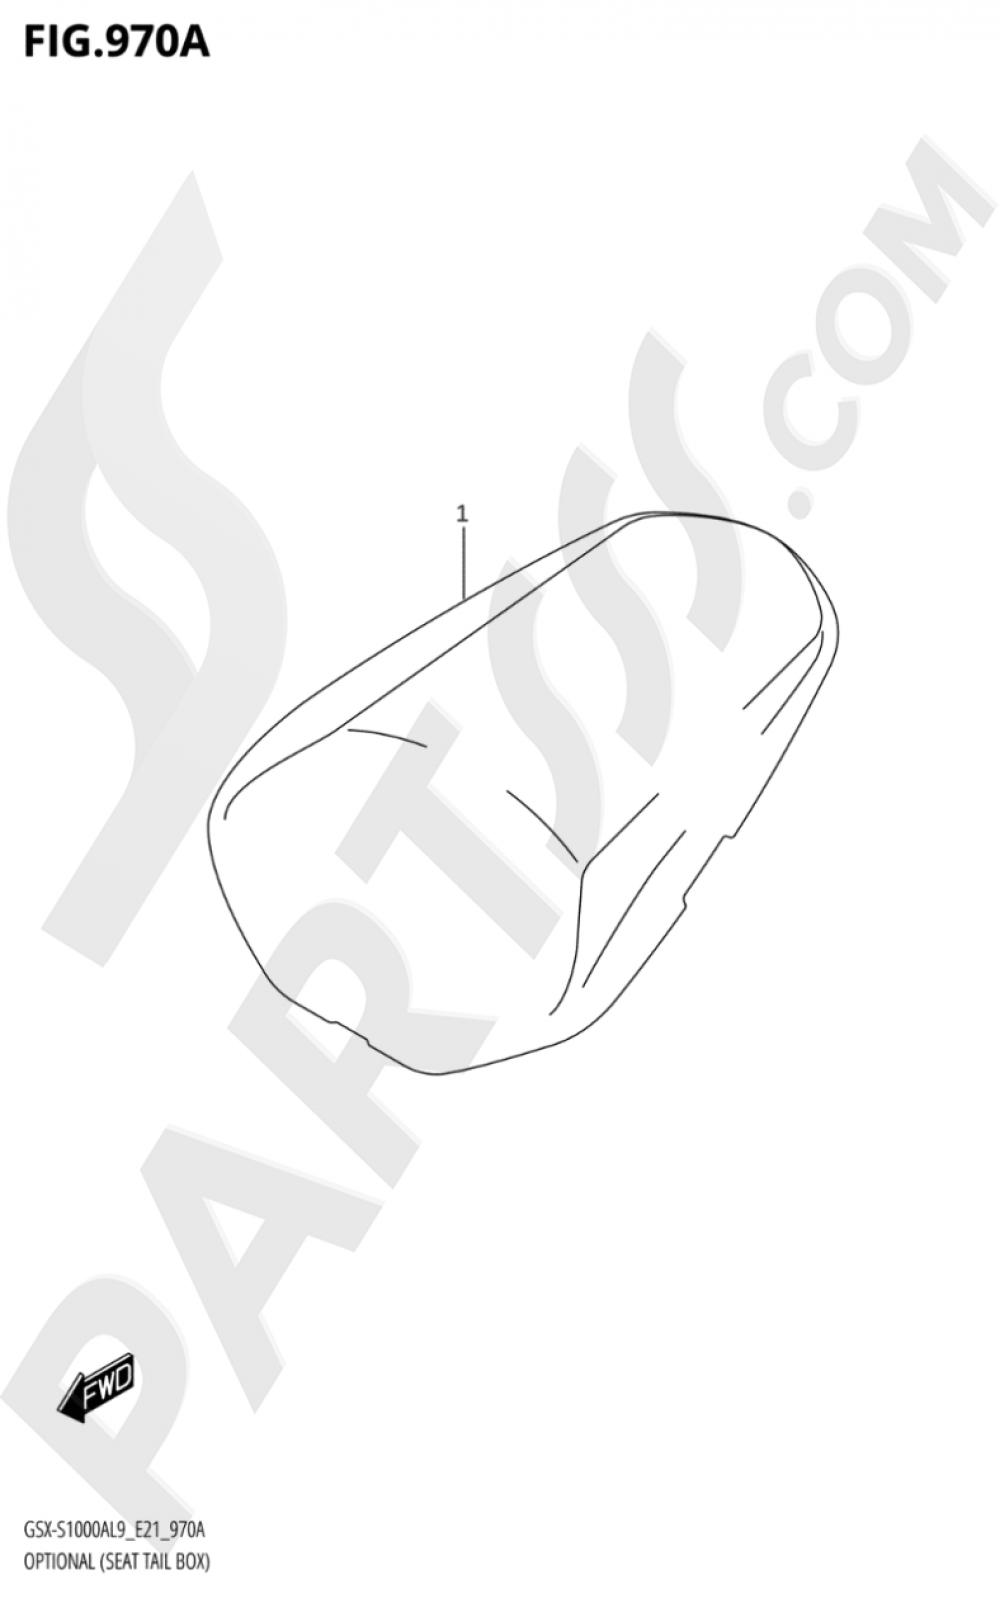 970A - OPTIONAL (SEAT TAIL BOX) Suzuki GSX-S1000A 2019